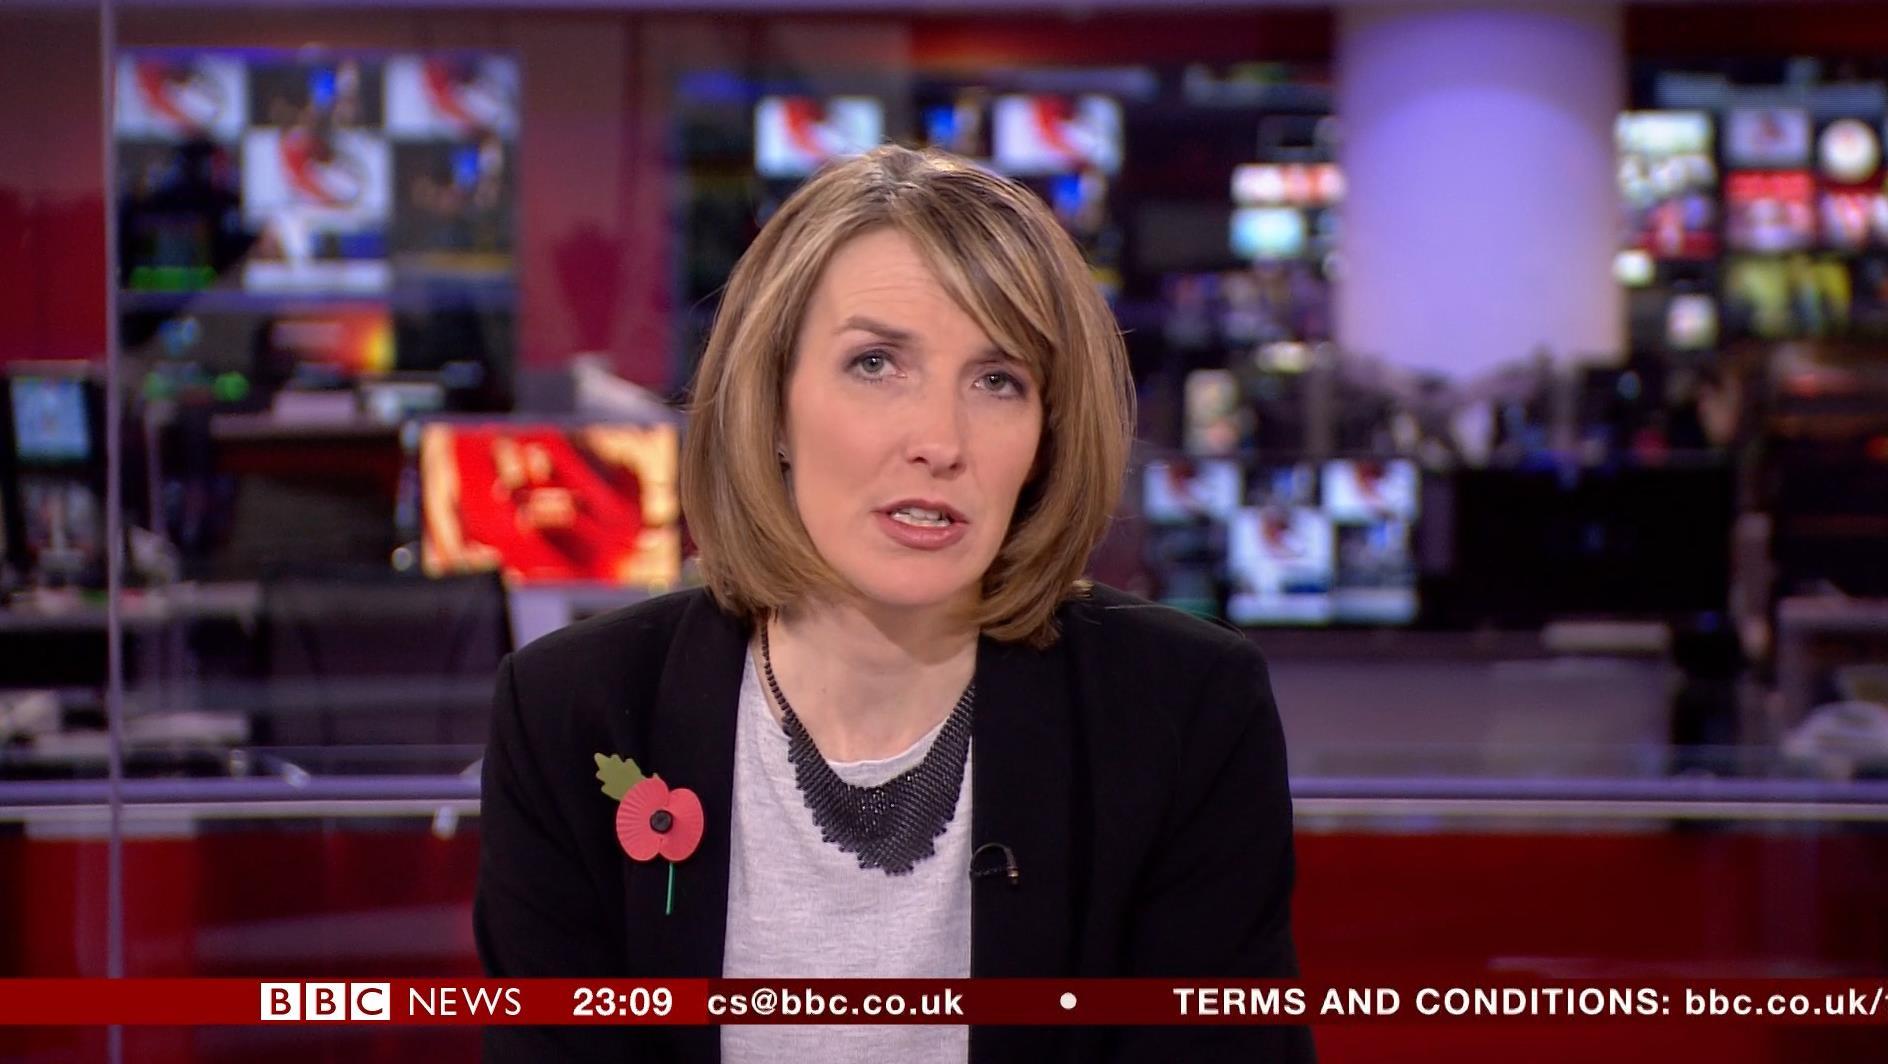 Rachel Schofield - BBC News Presenter (5)